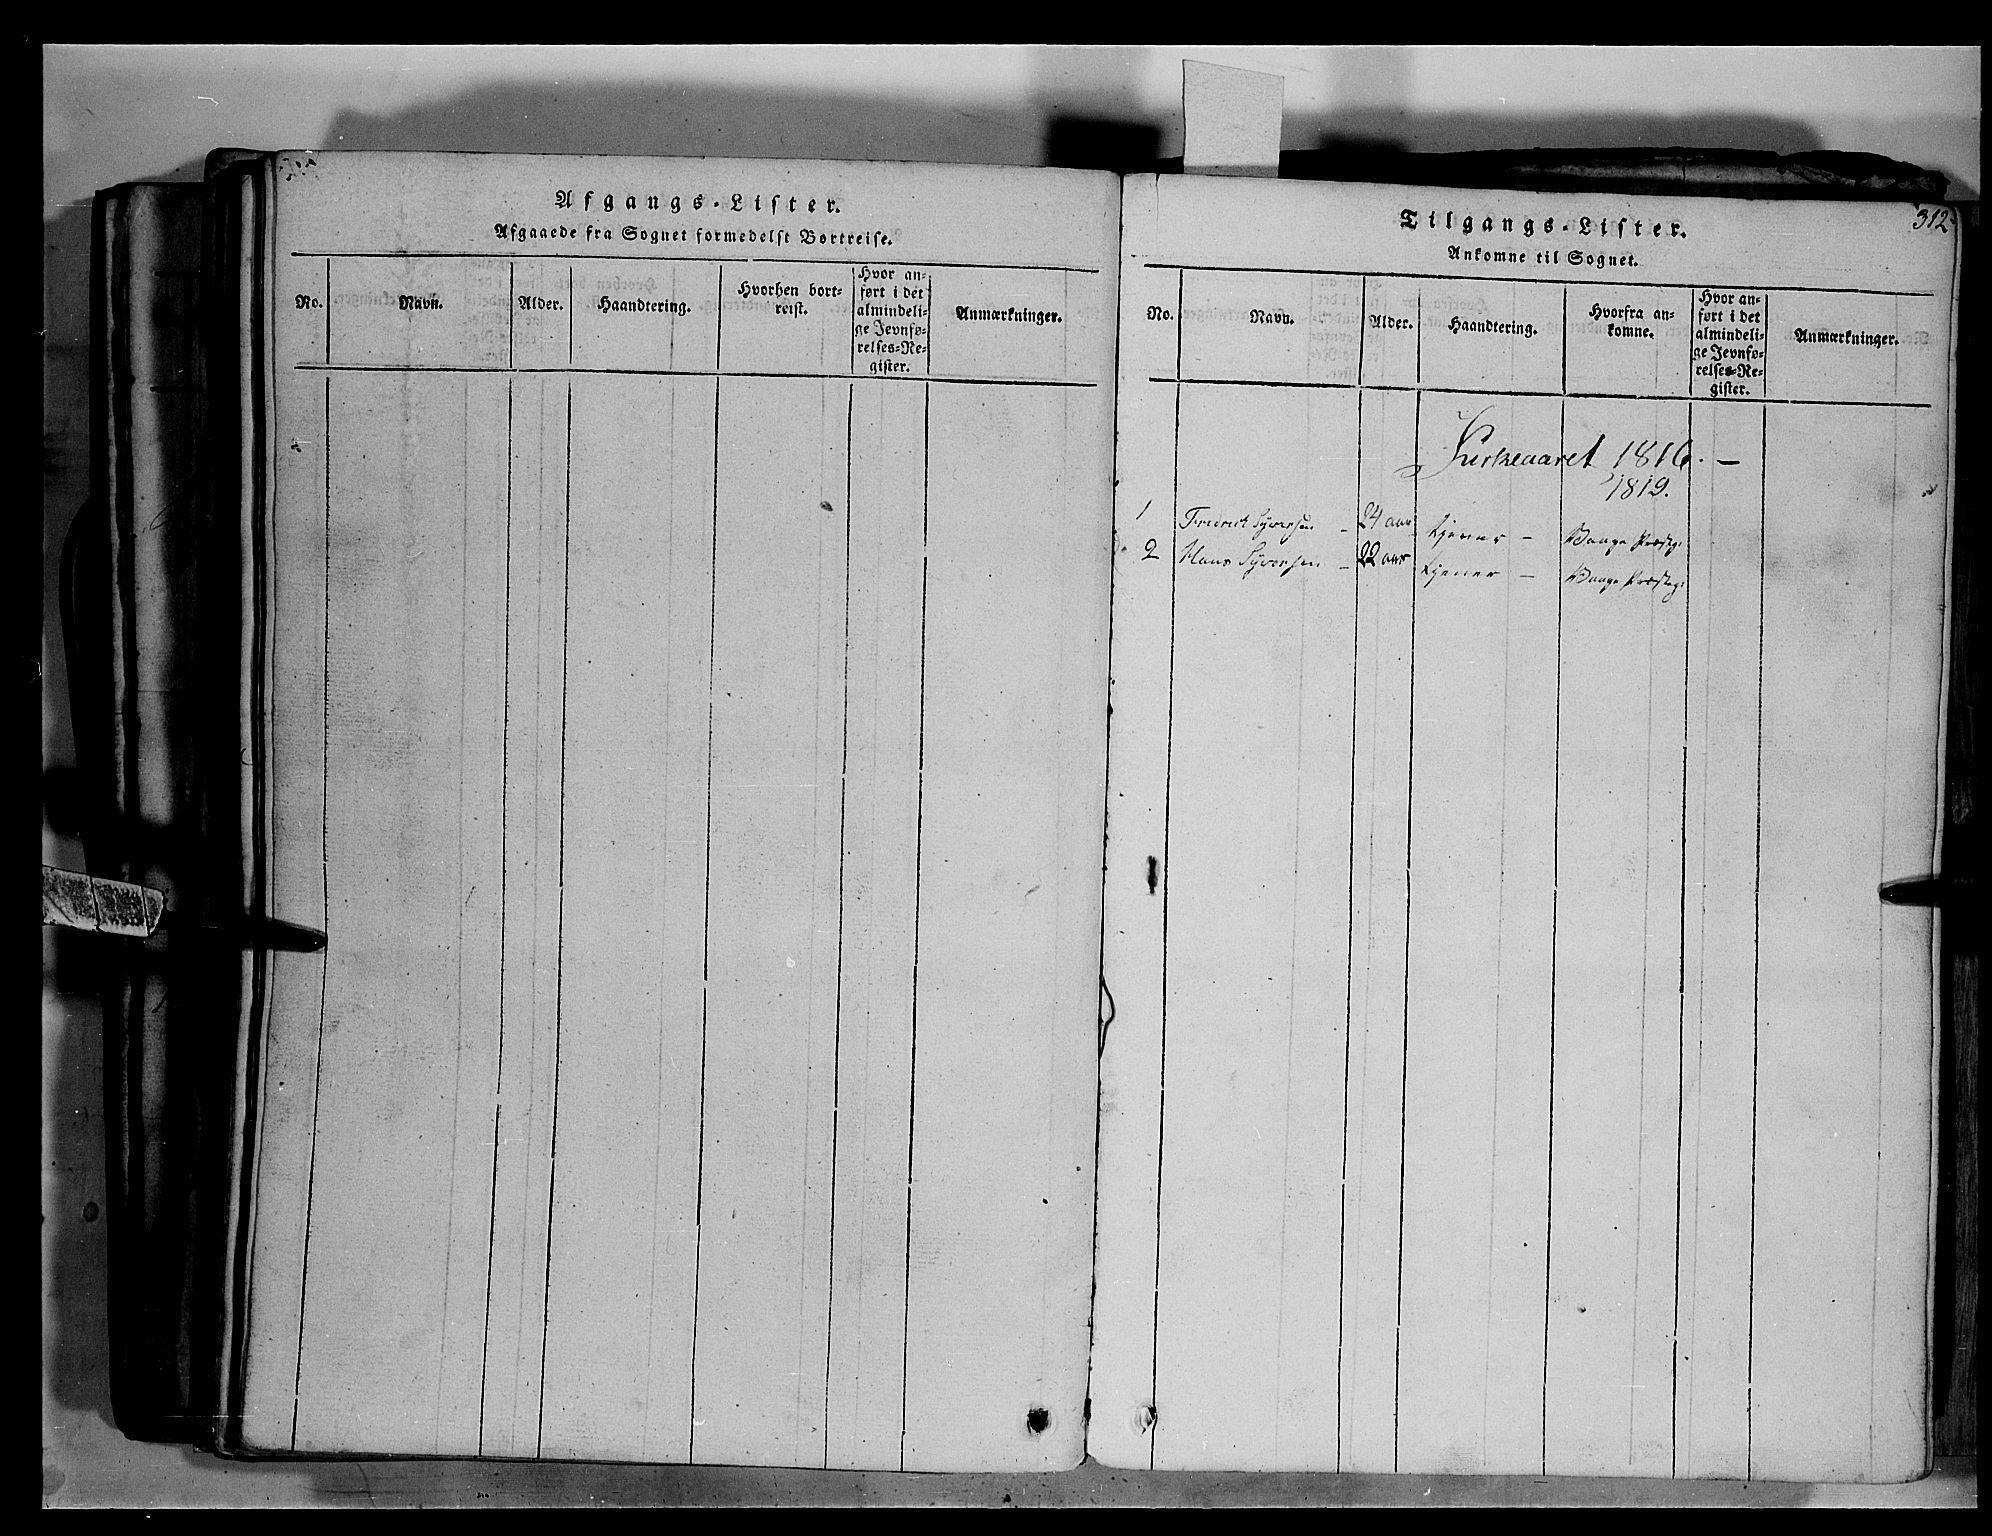 SAH, Fron prestekontor, H/Ha/Hab/L0003: Klokkerbok nr. 3, 1816-1850, s. 312